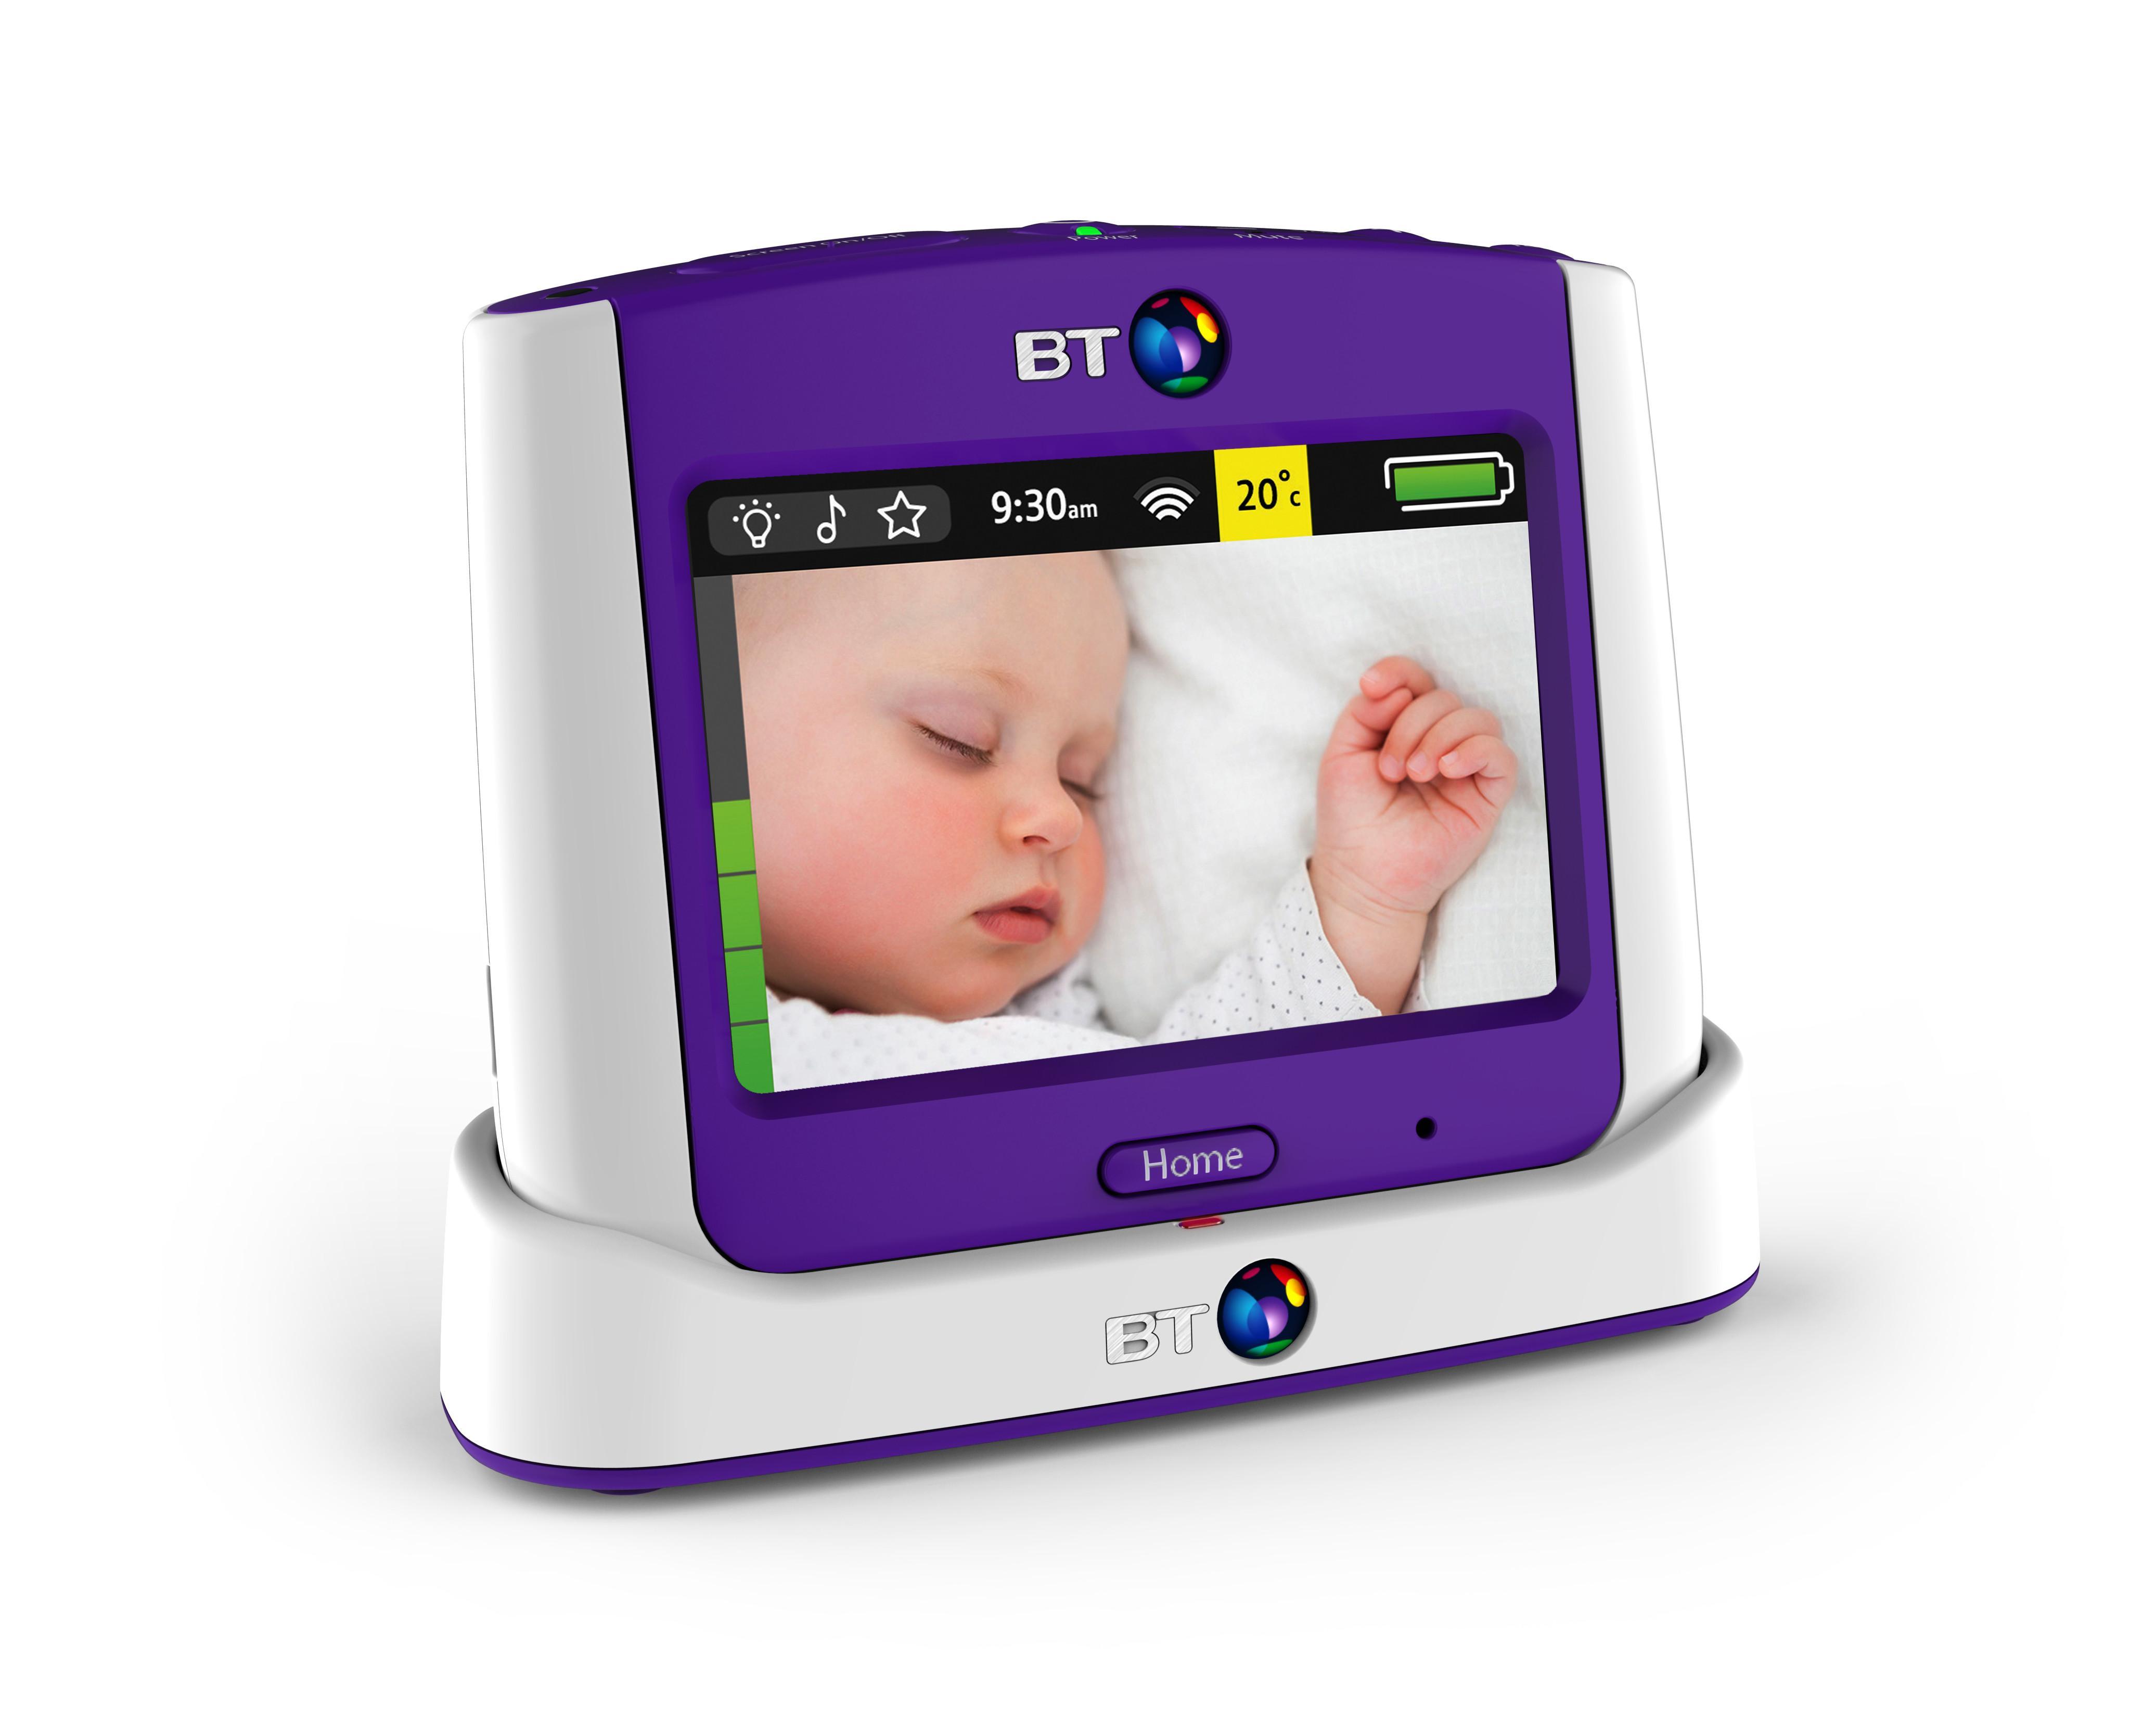 bt video baby monitor 7500 lightshow baby. Black Bedroom Furniture Sets. Home Design Ideas